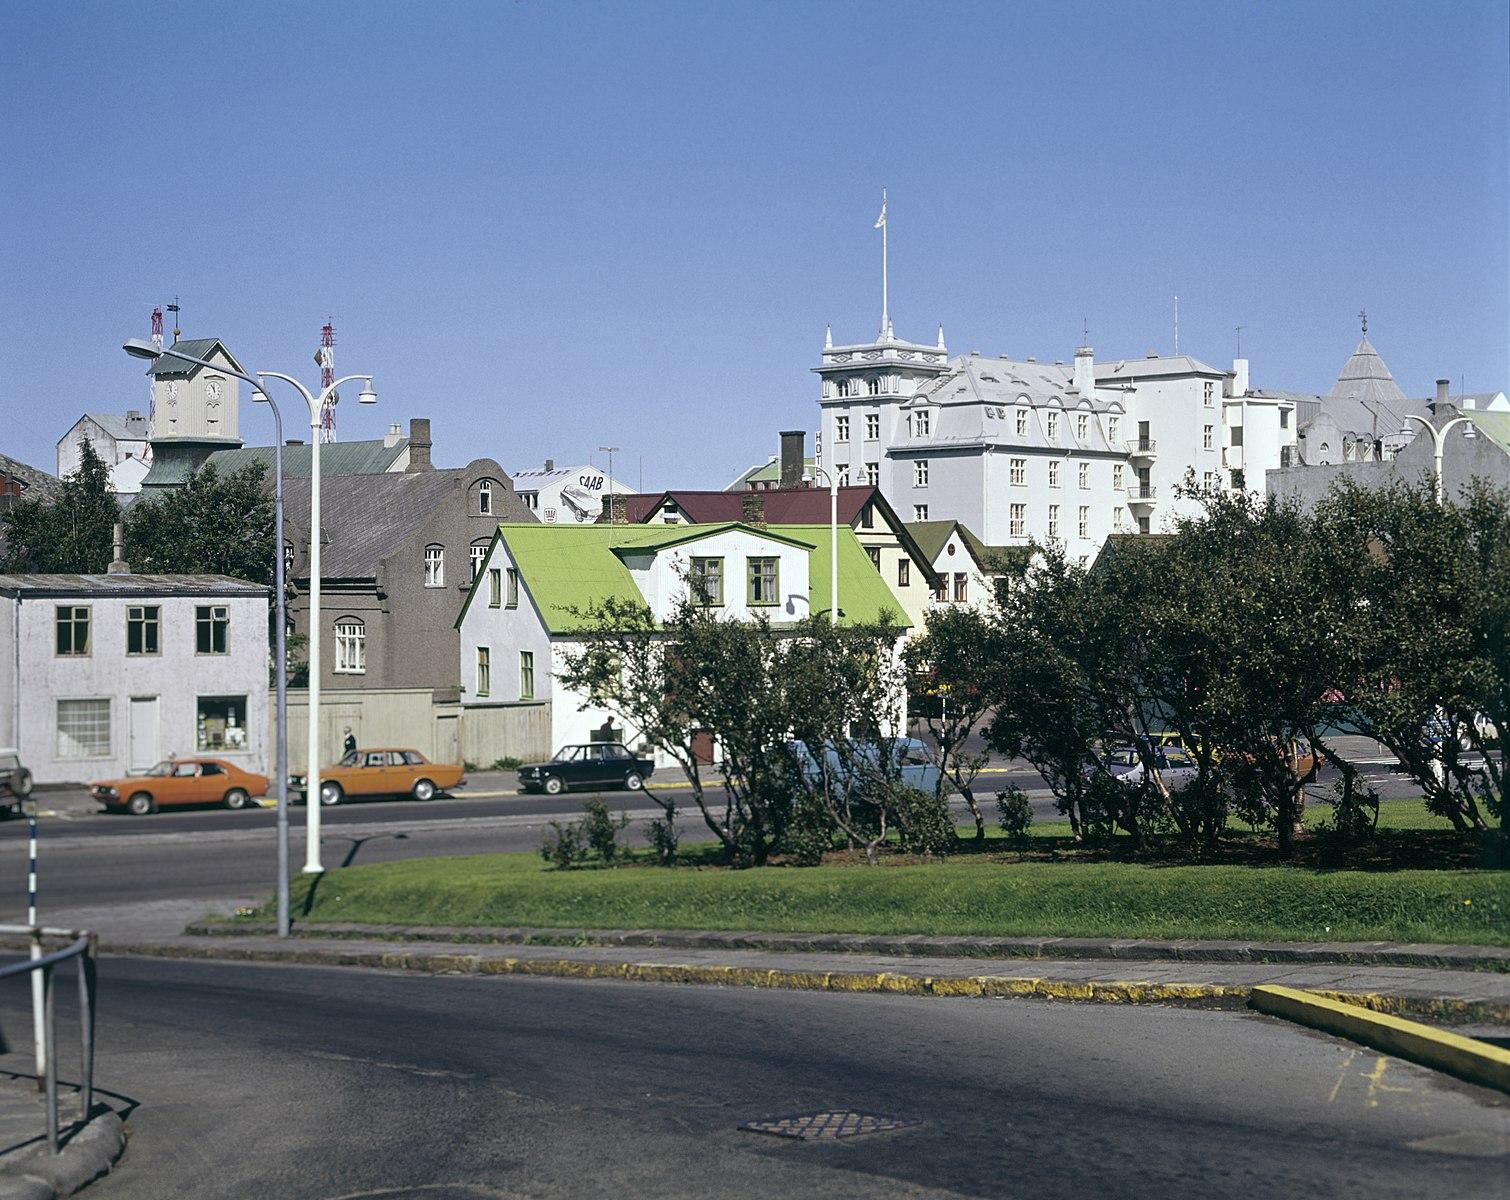 Laekjargata is one of the oldest streets in Reykjavik!